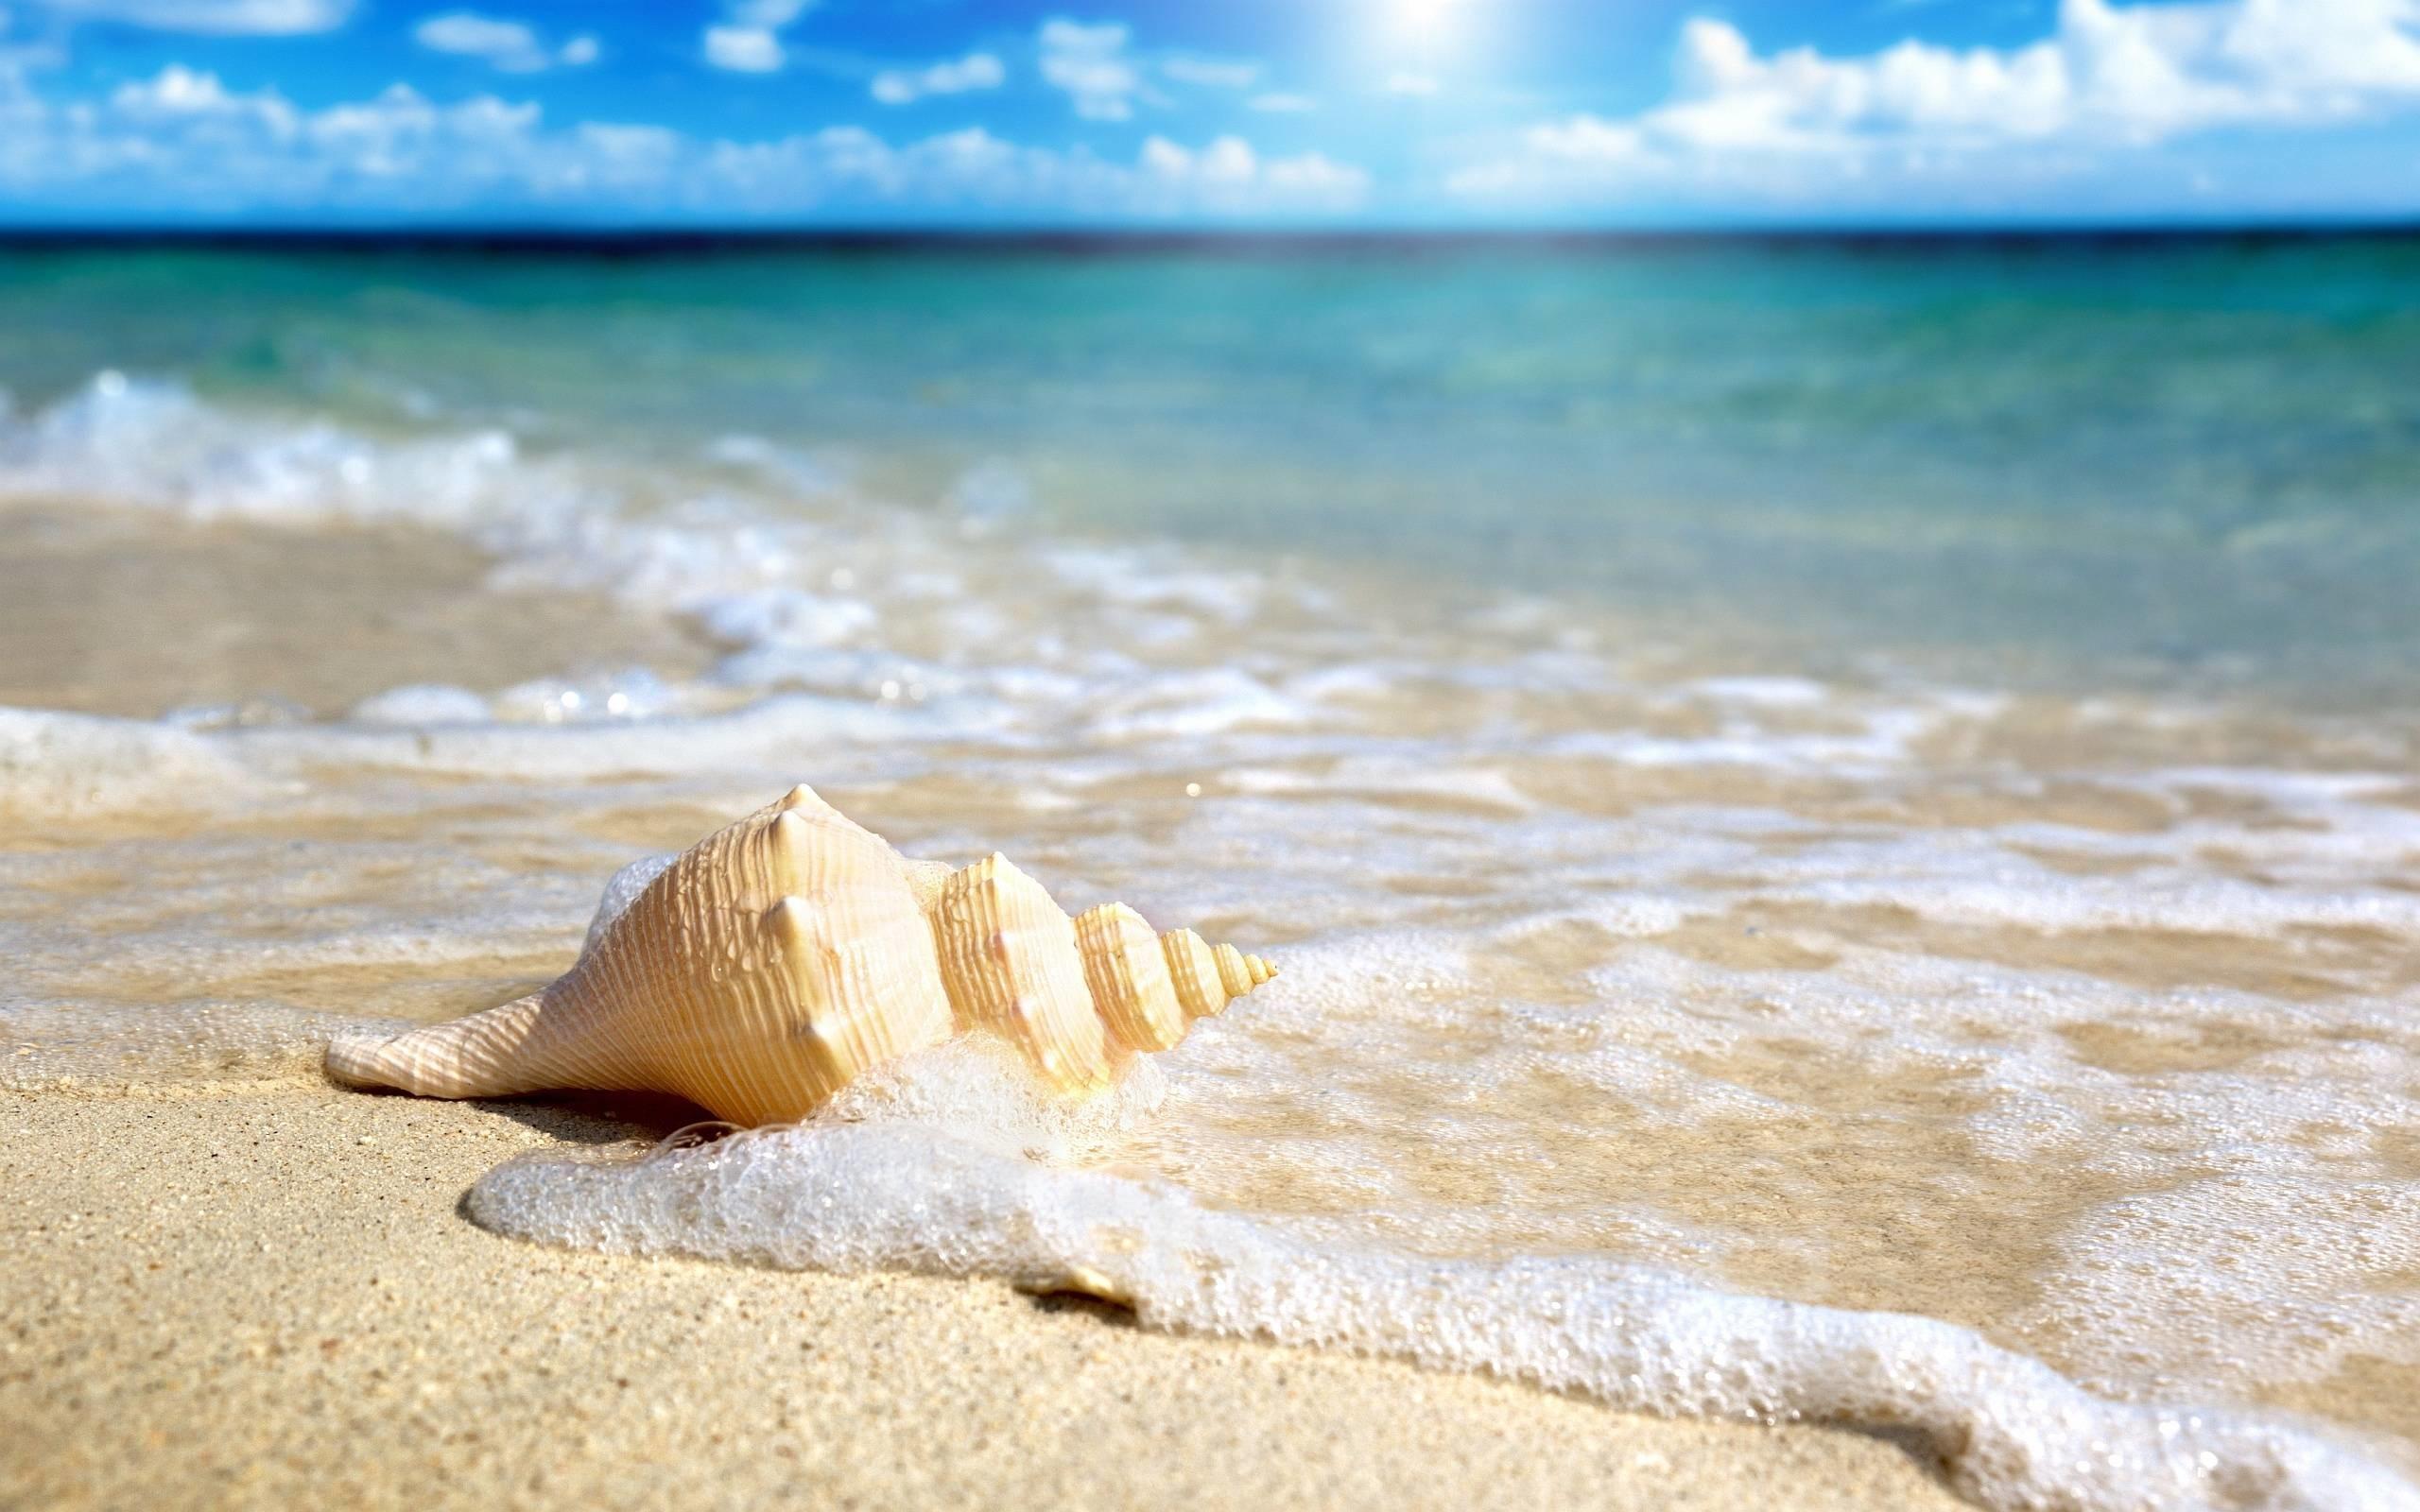 Permalink to Seashells On The Beach Wallpaper